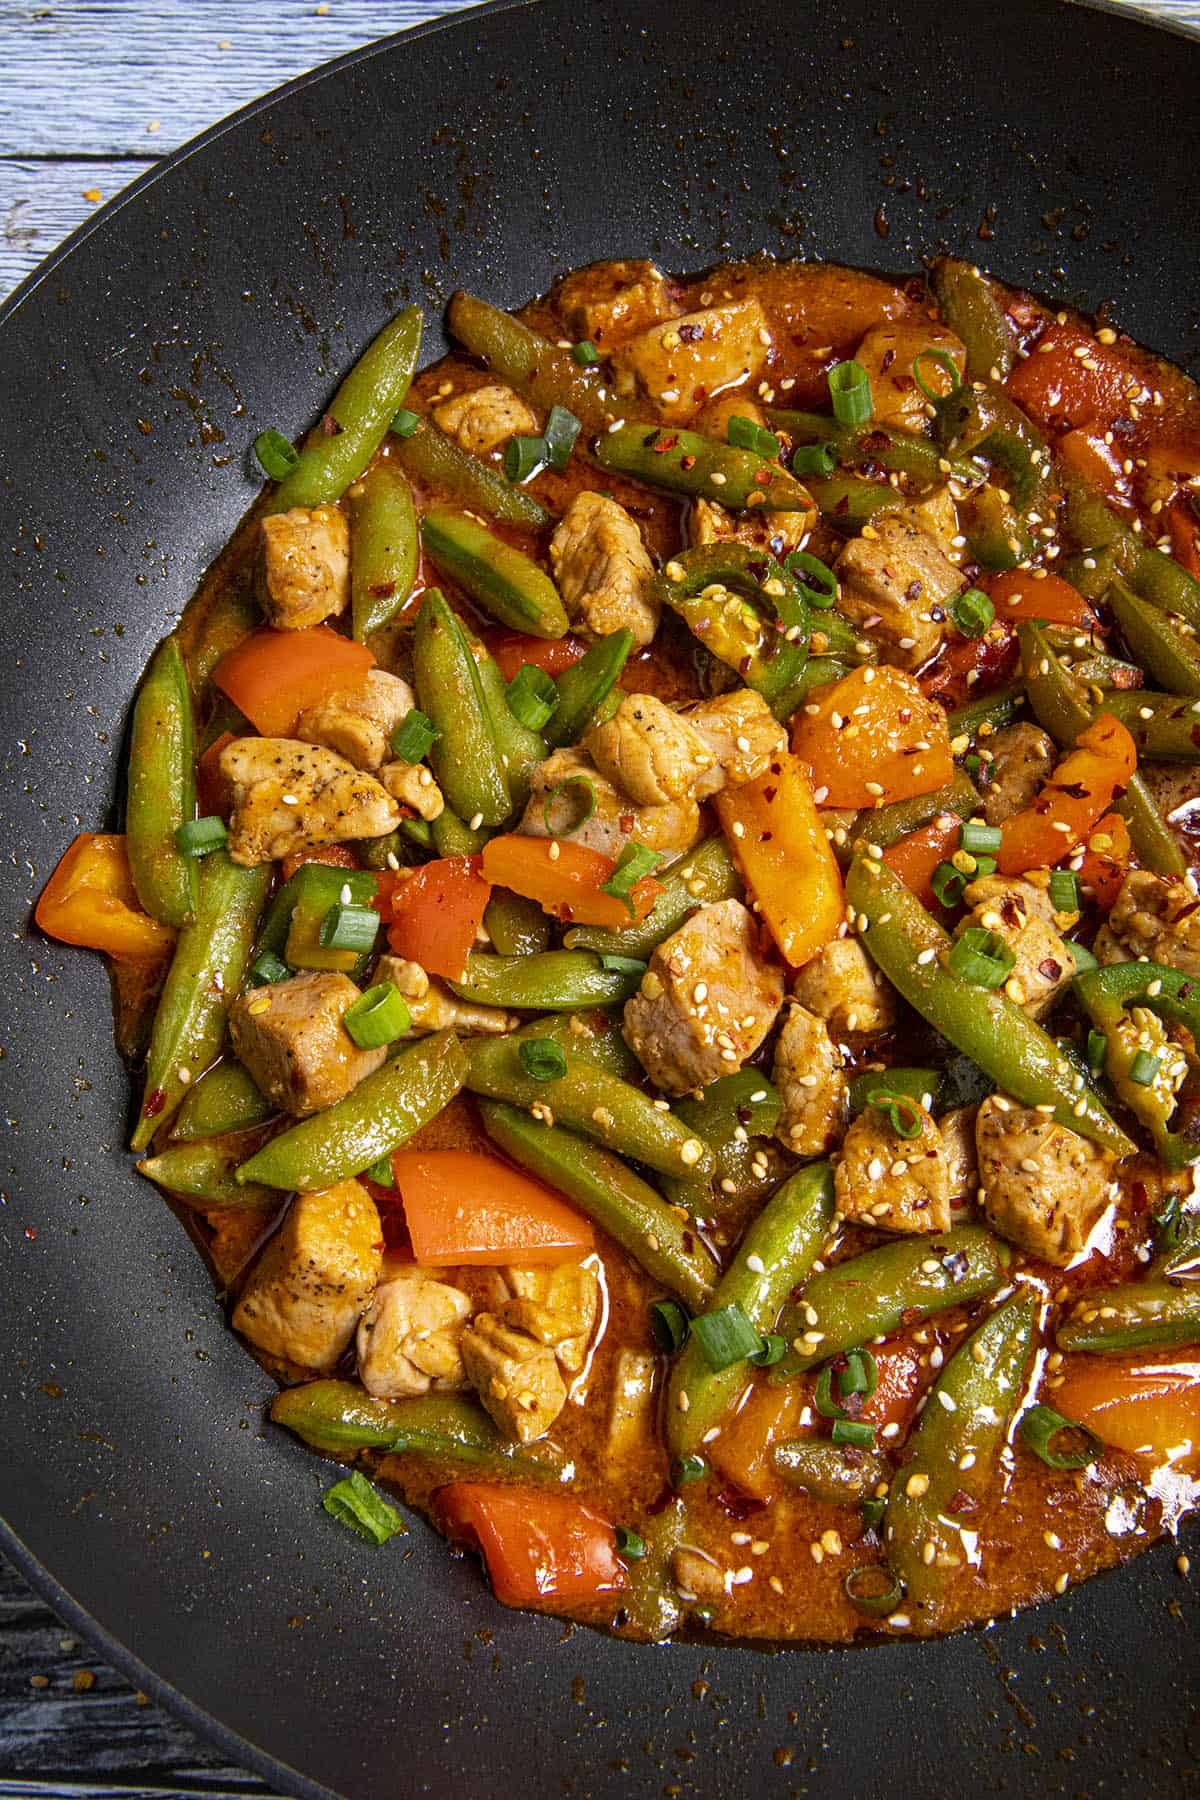 Spicy Pork Stir Fry in a pan, ready to serve